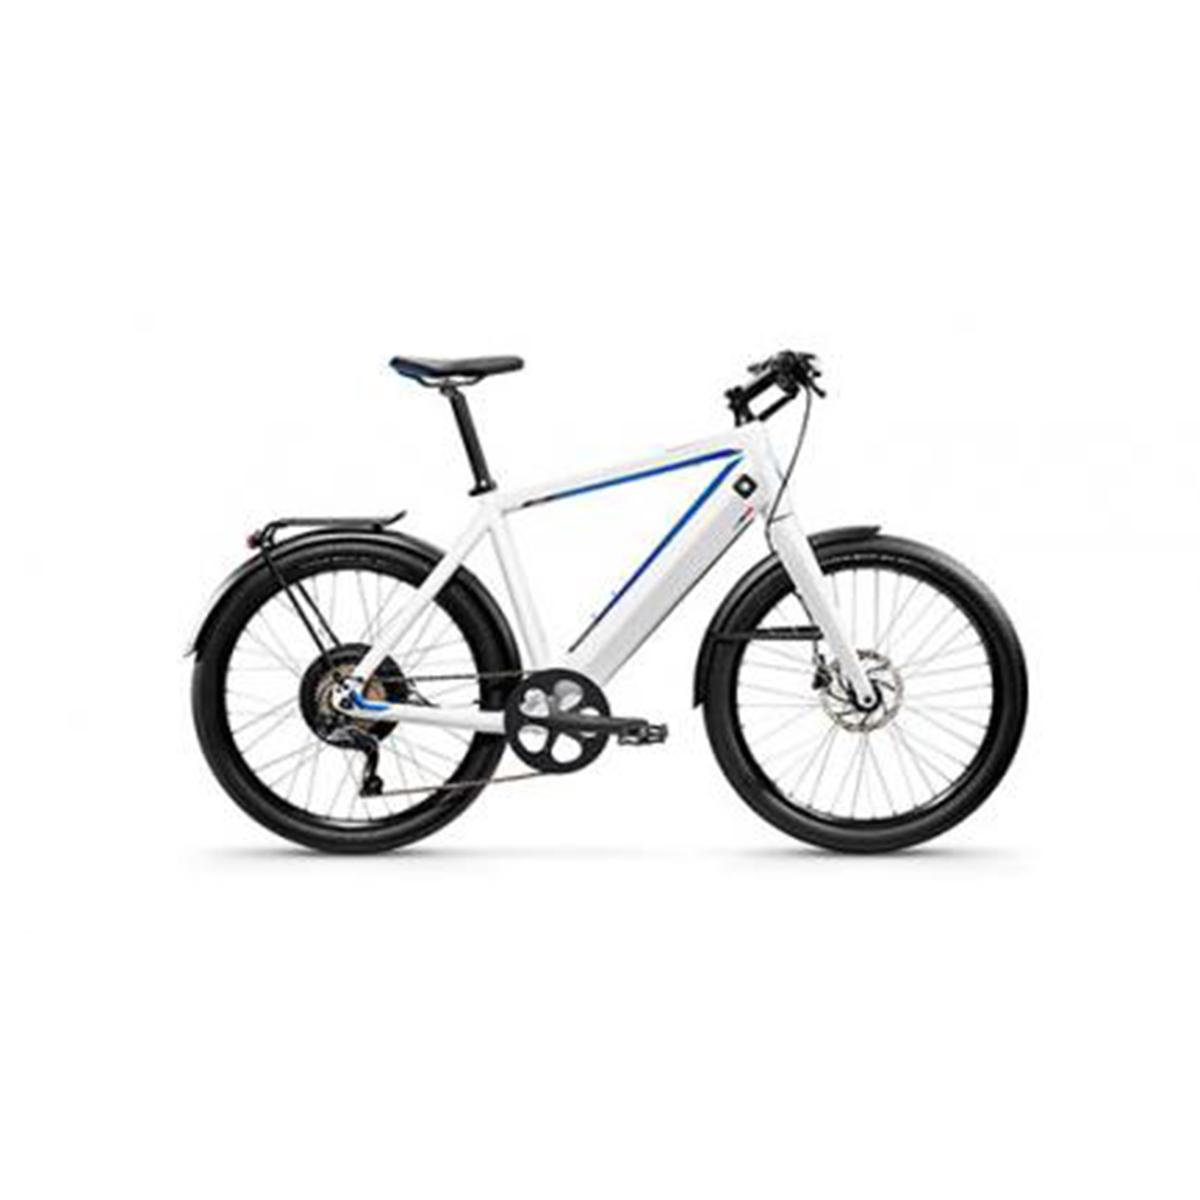 Stromer ST1 Electric Bike